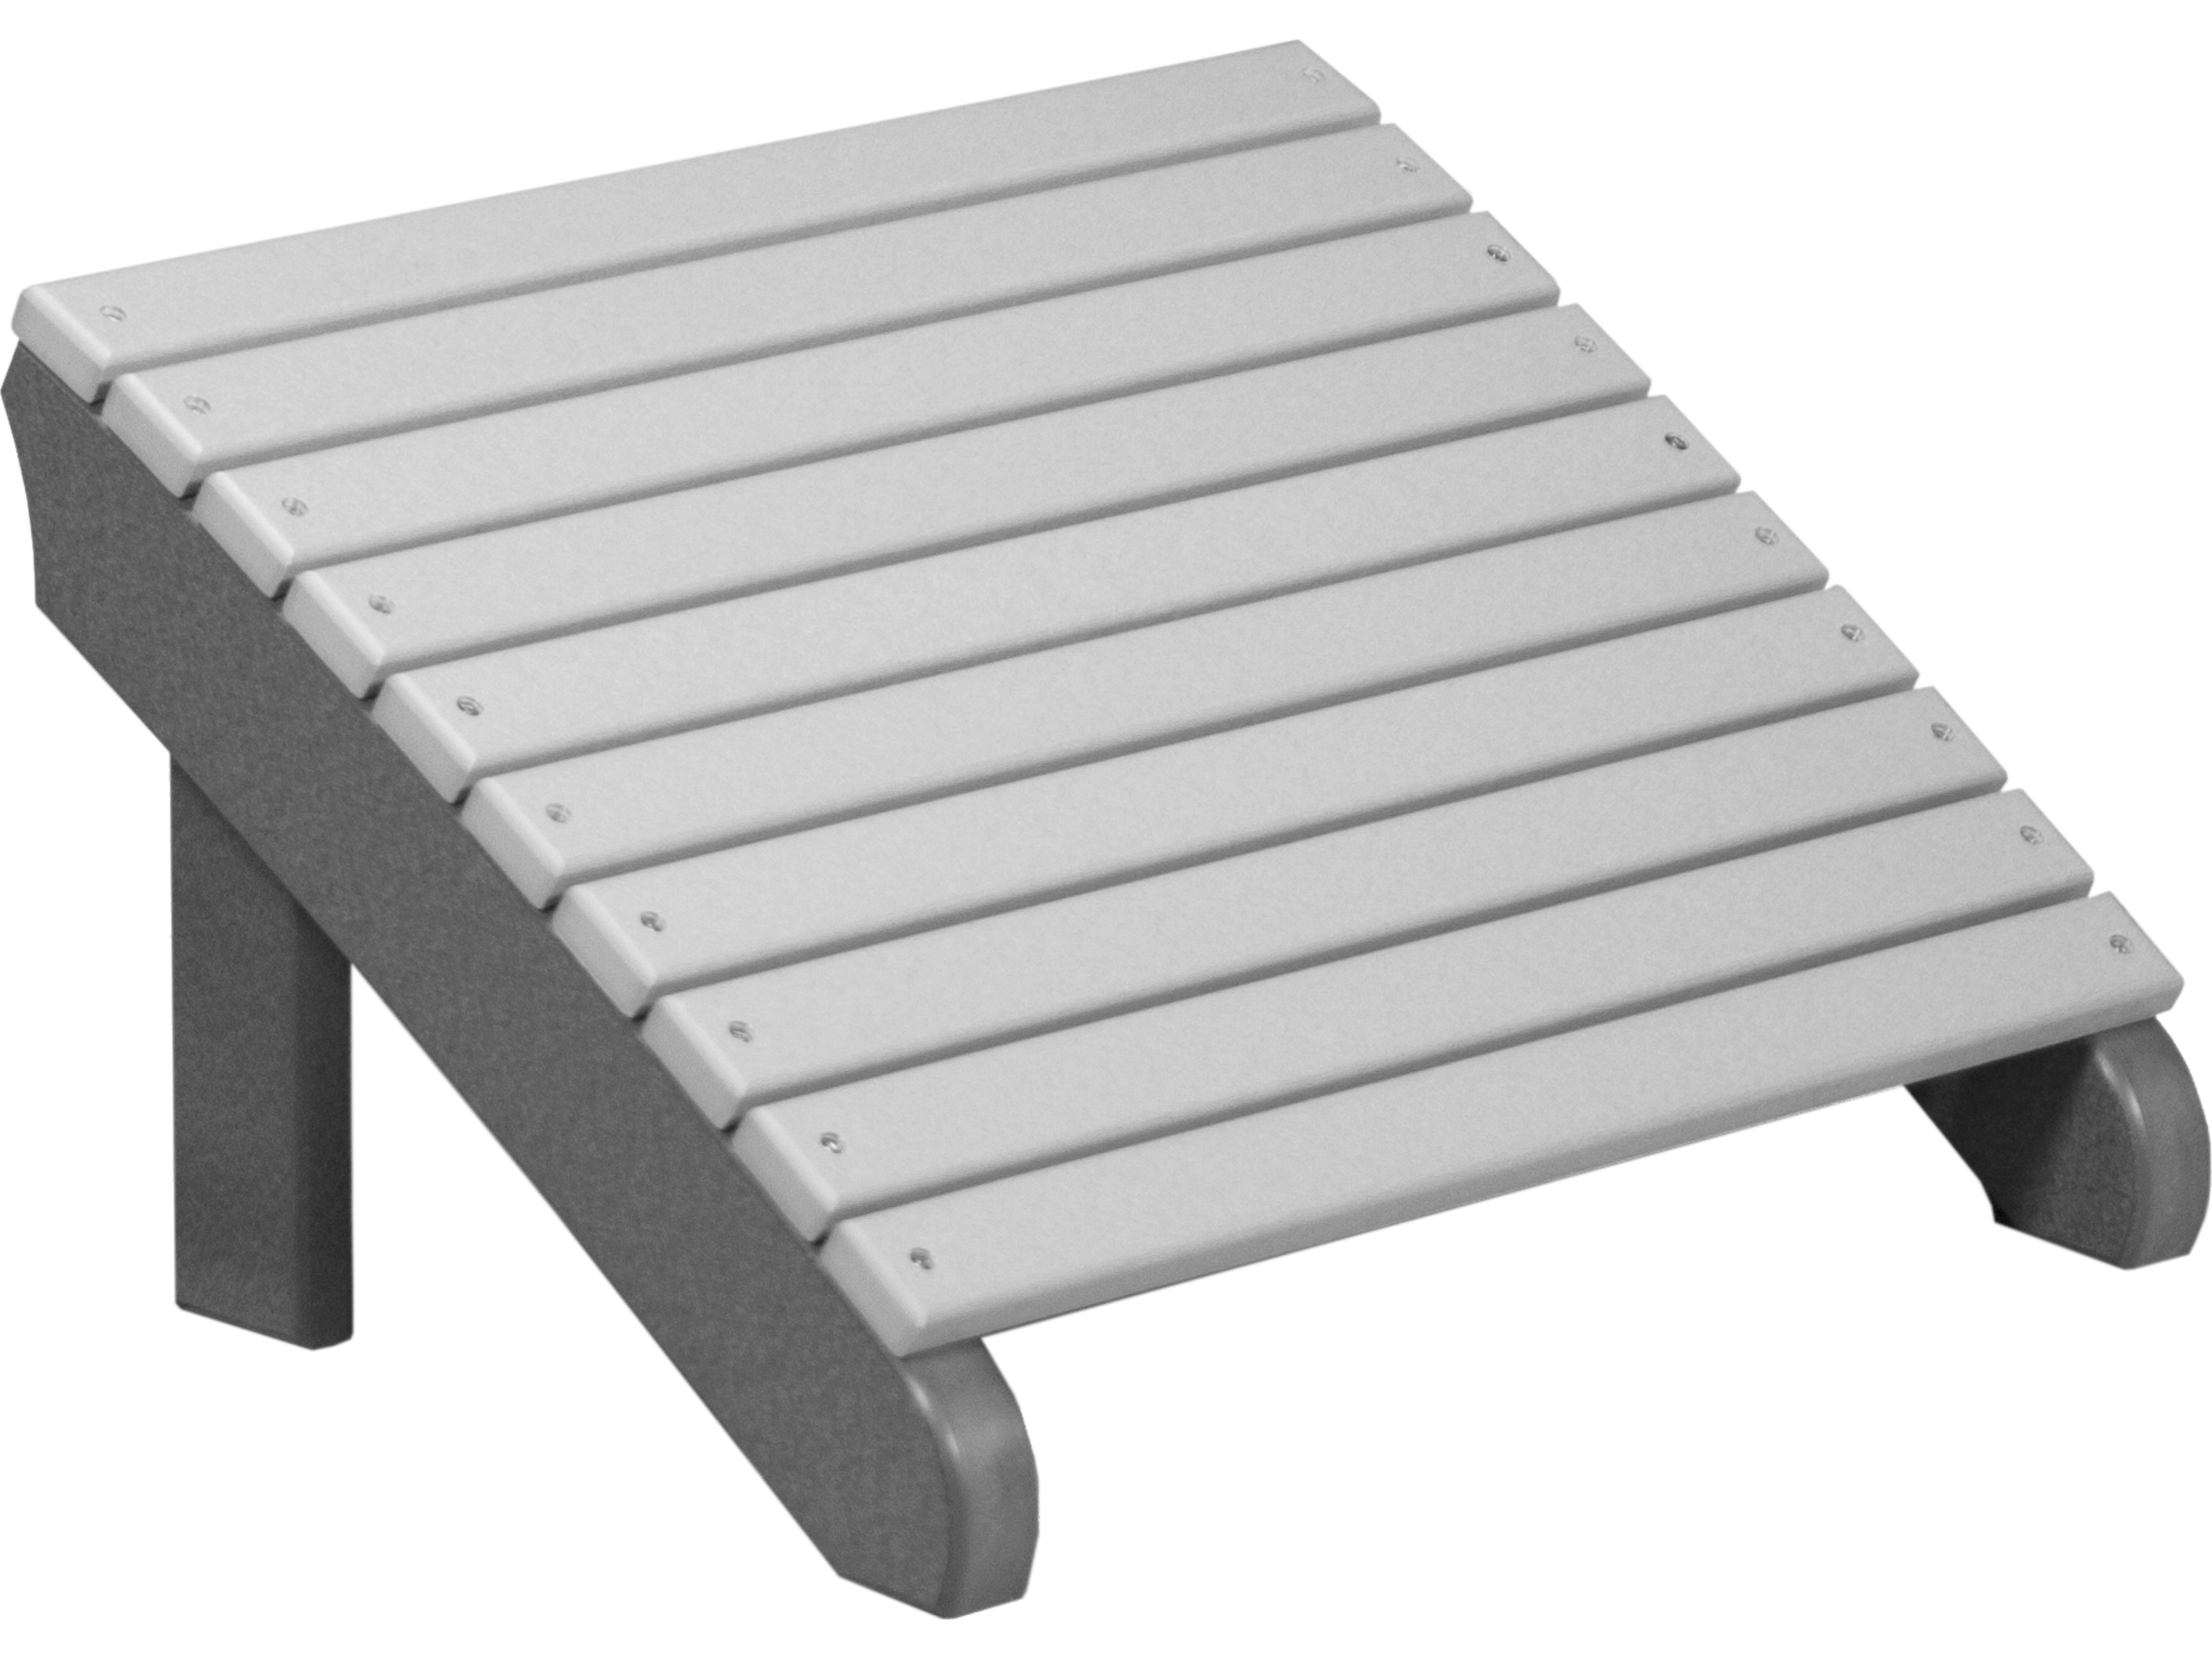 Luxcraft recycled plastic deluxe adirondack footrest pdaf - Plastic adirondack footrest ...